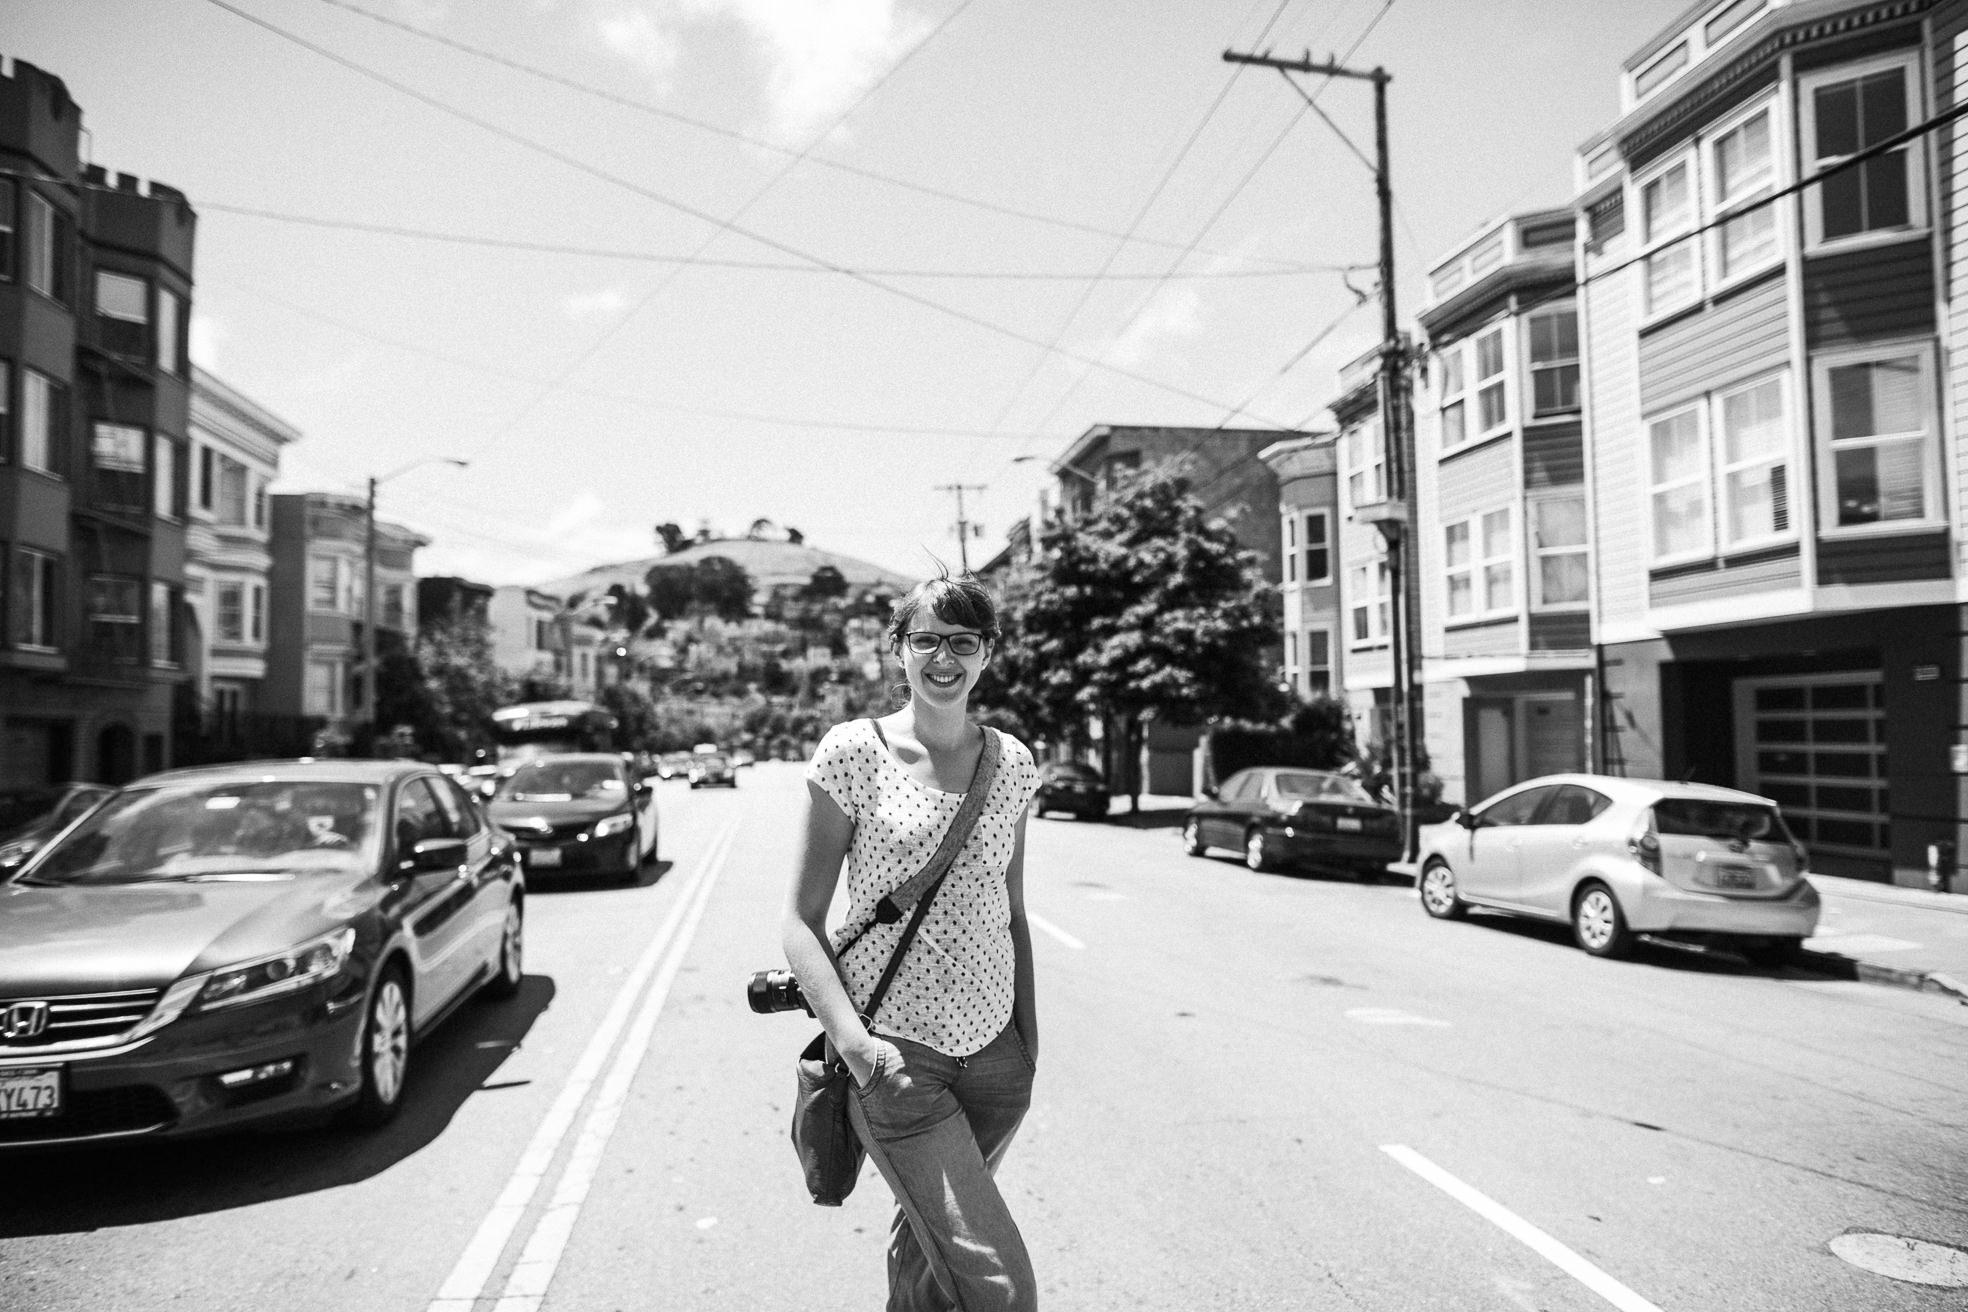 San-Francisco-BildervomLeben-4949